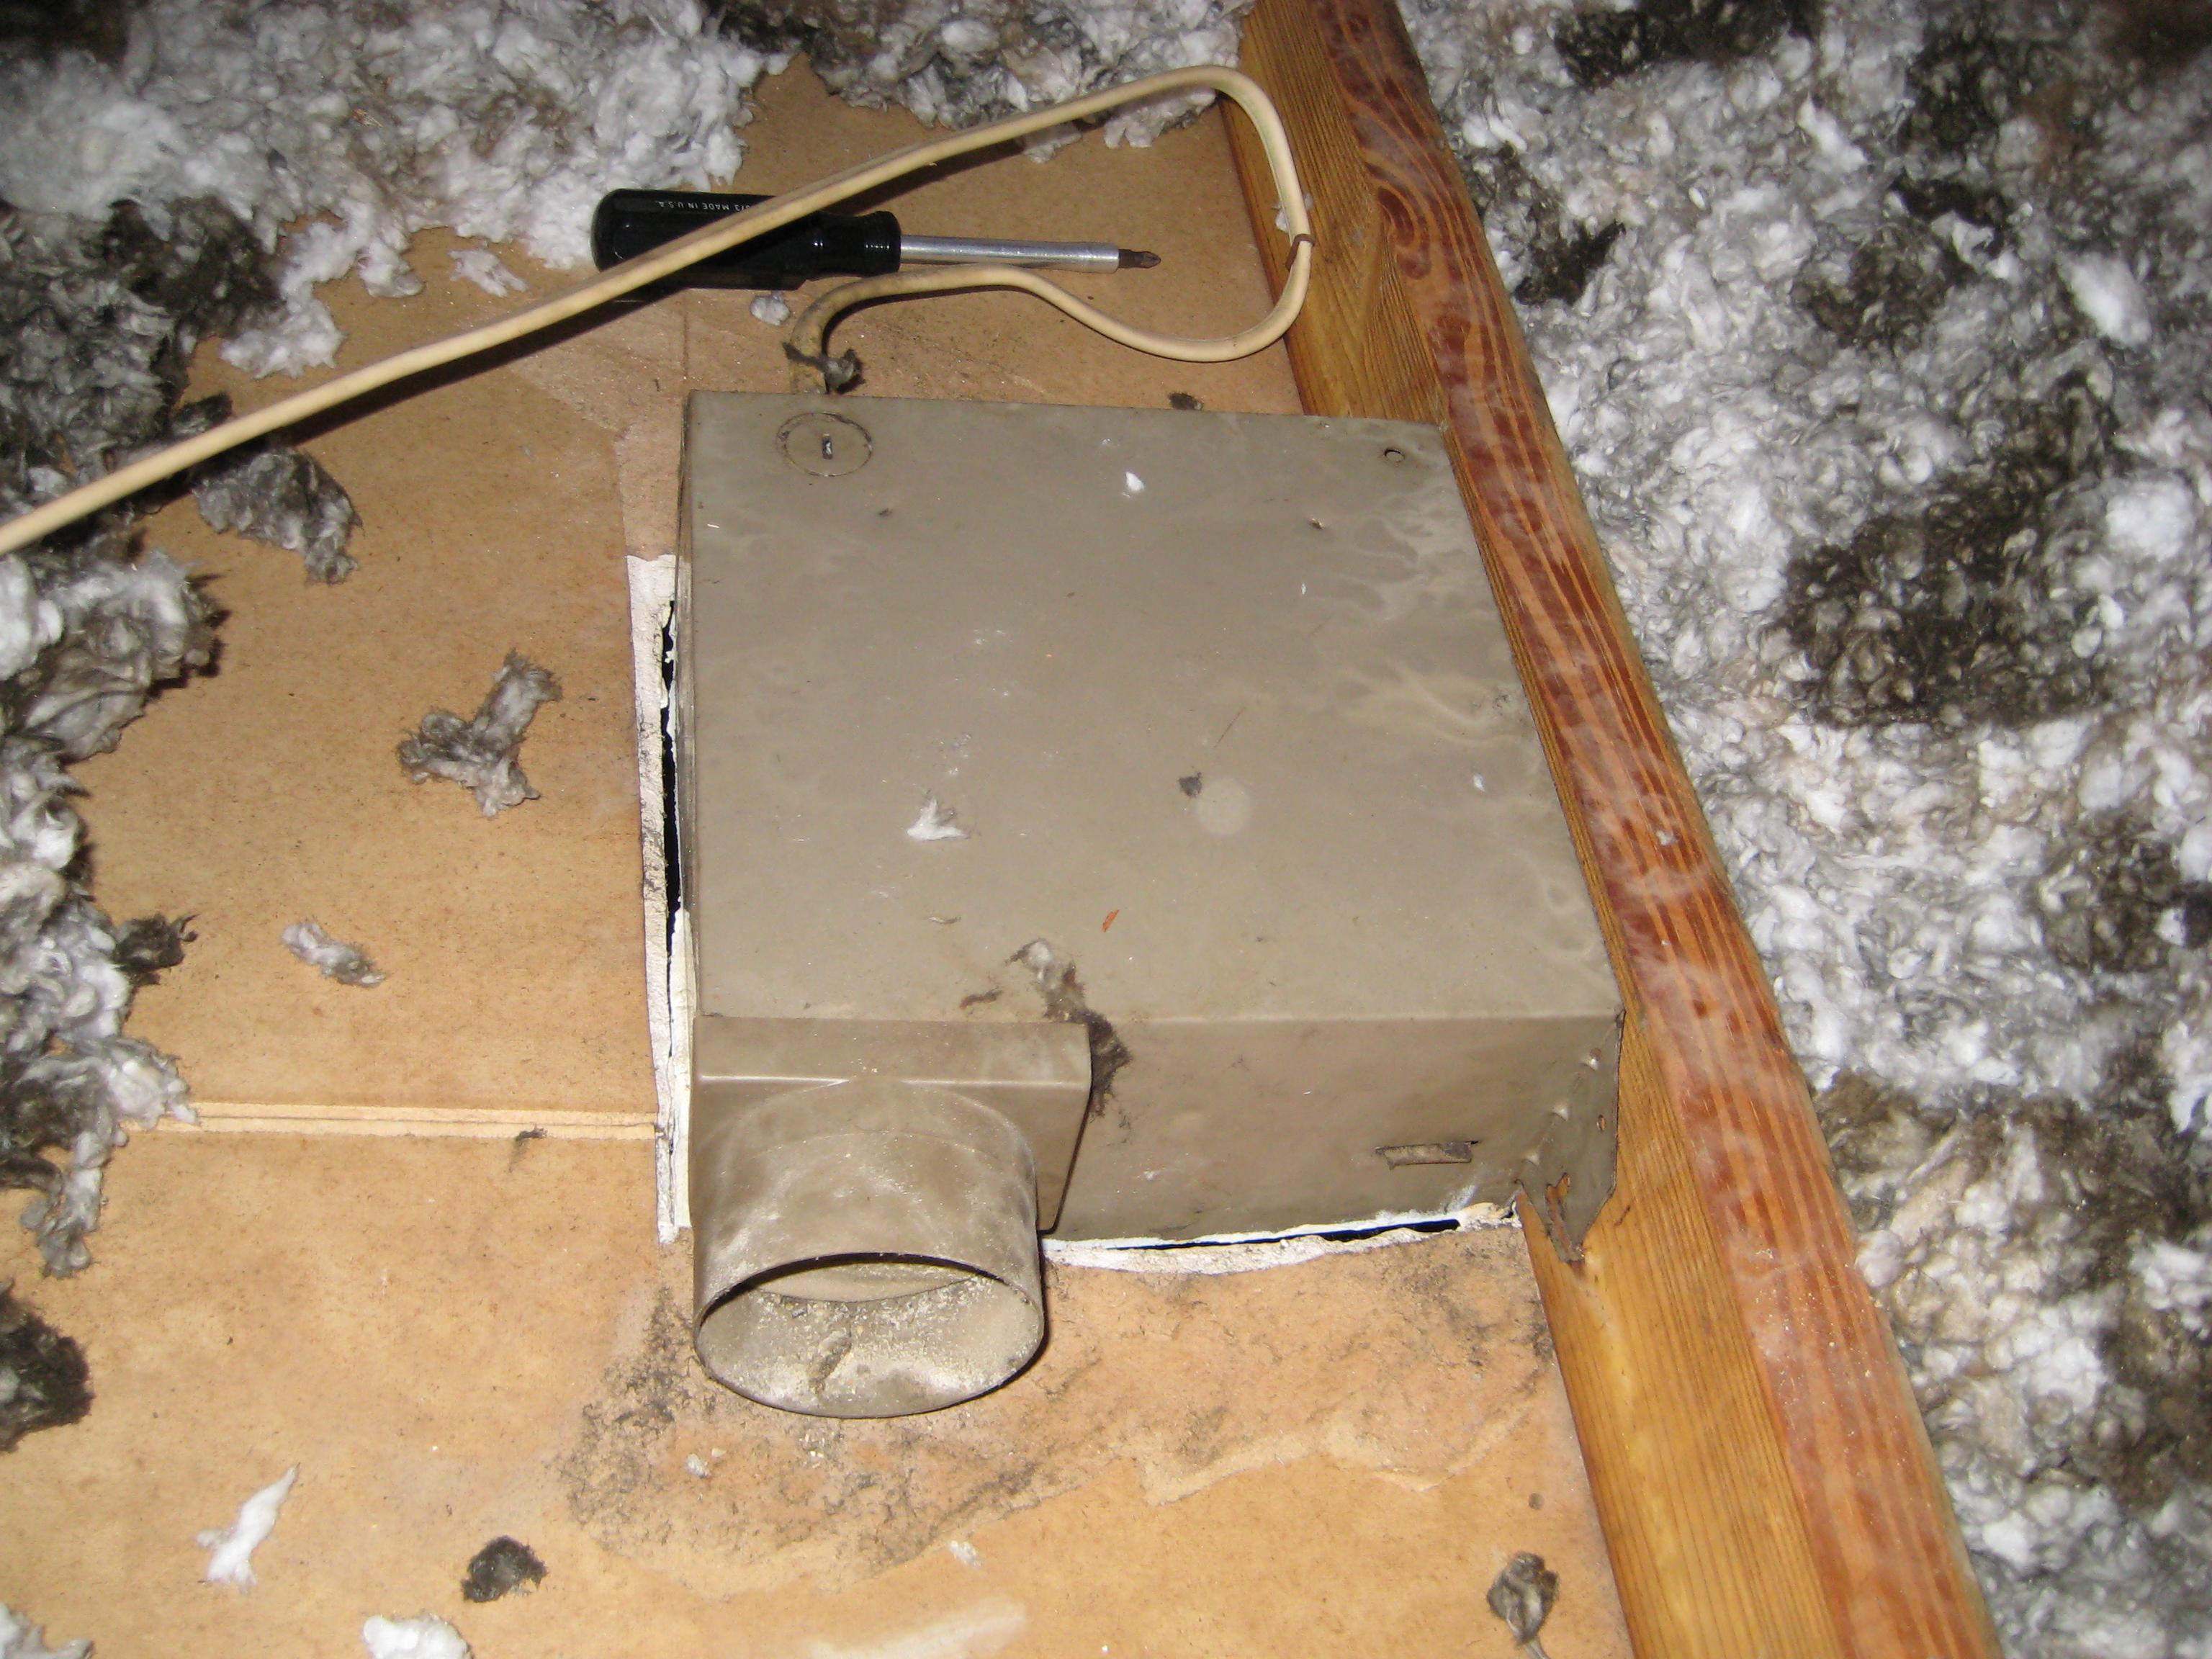 whoa what happened to my bathroom vent